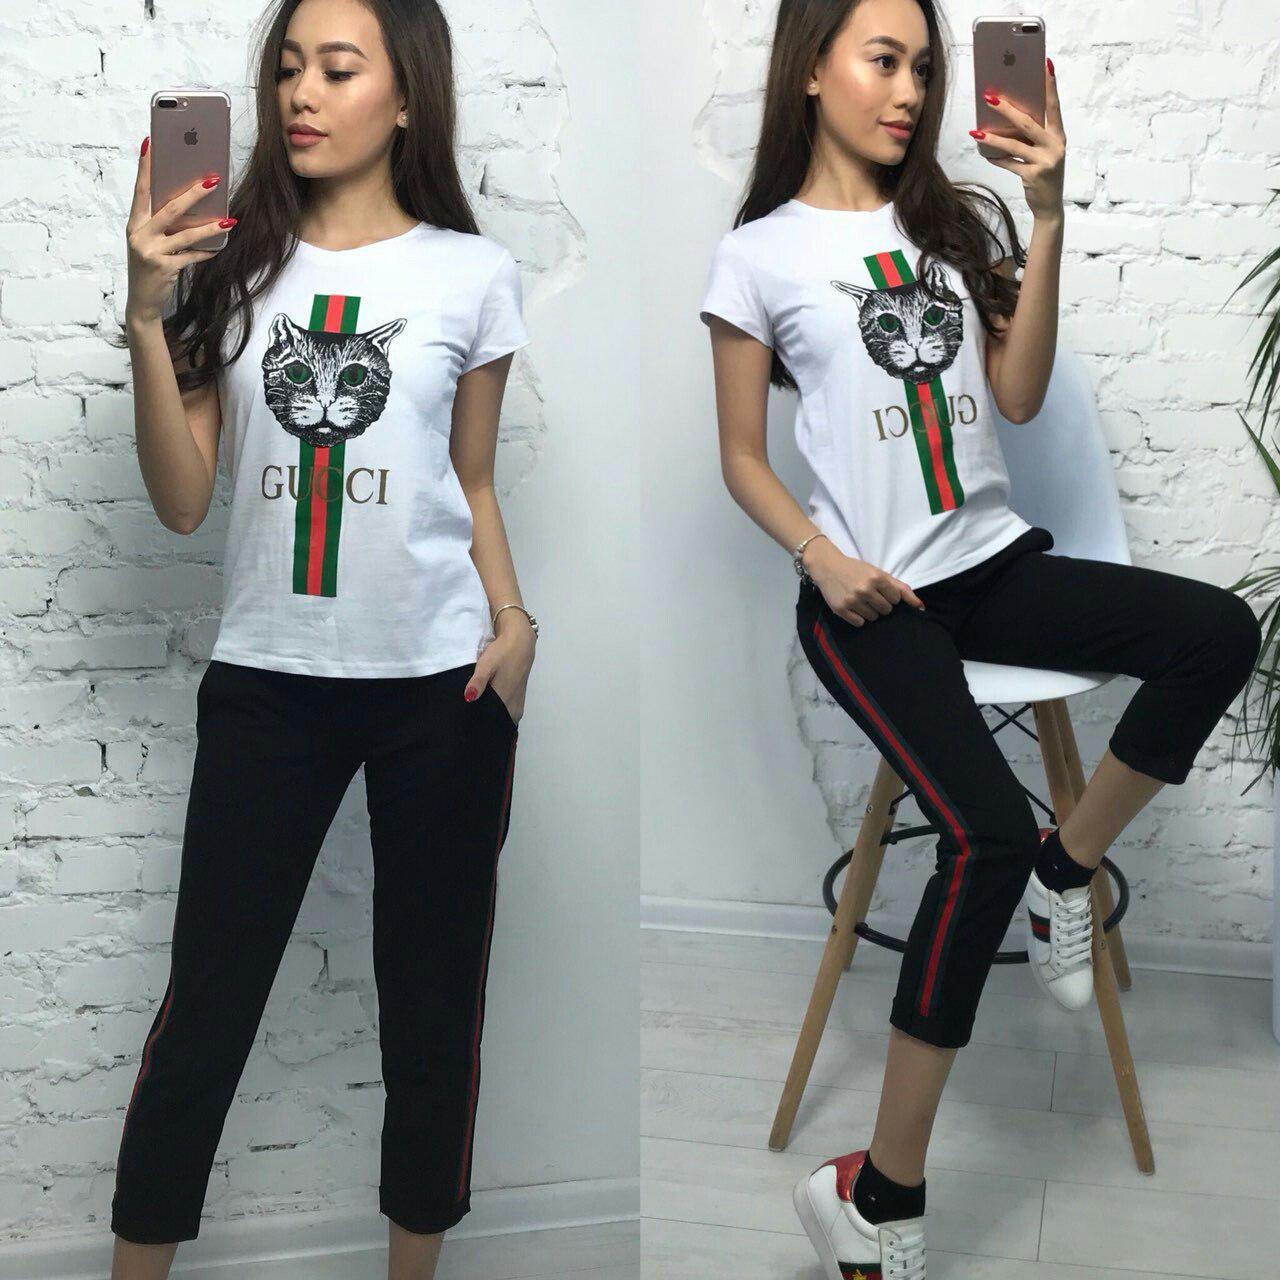 Костюм женский спортивный футболка-брюки с лампасами GUCCI (много цветов) -  ЖАКЕТКА в d6ad19c1c2628